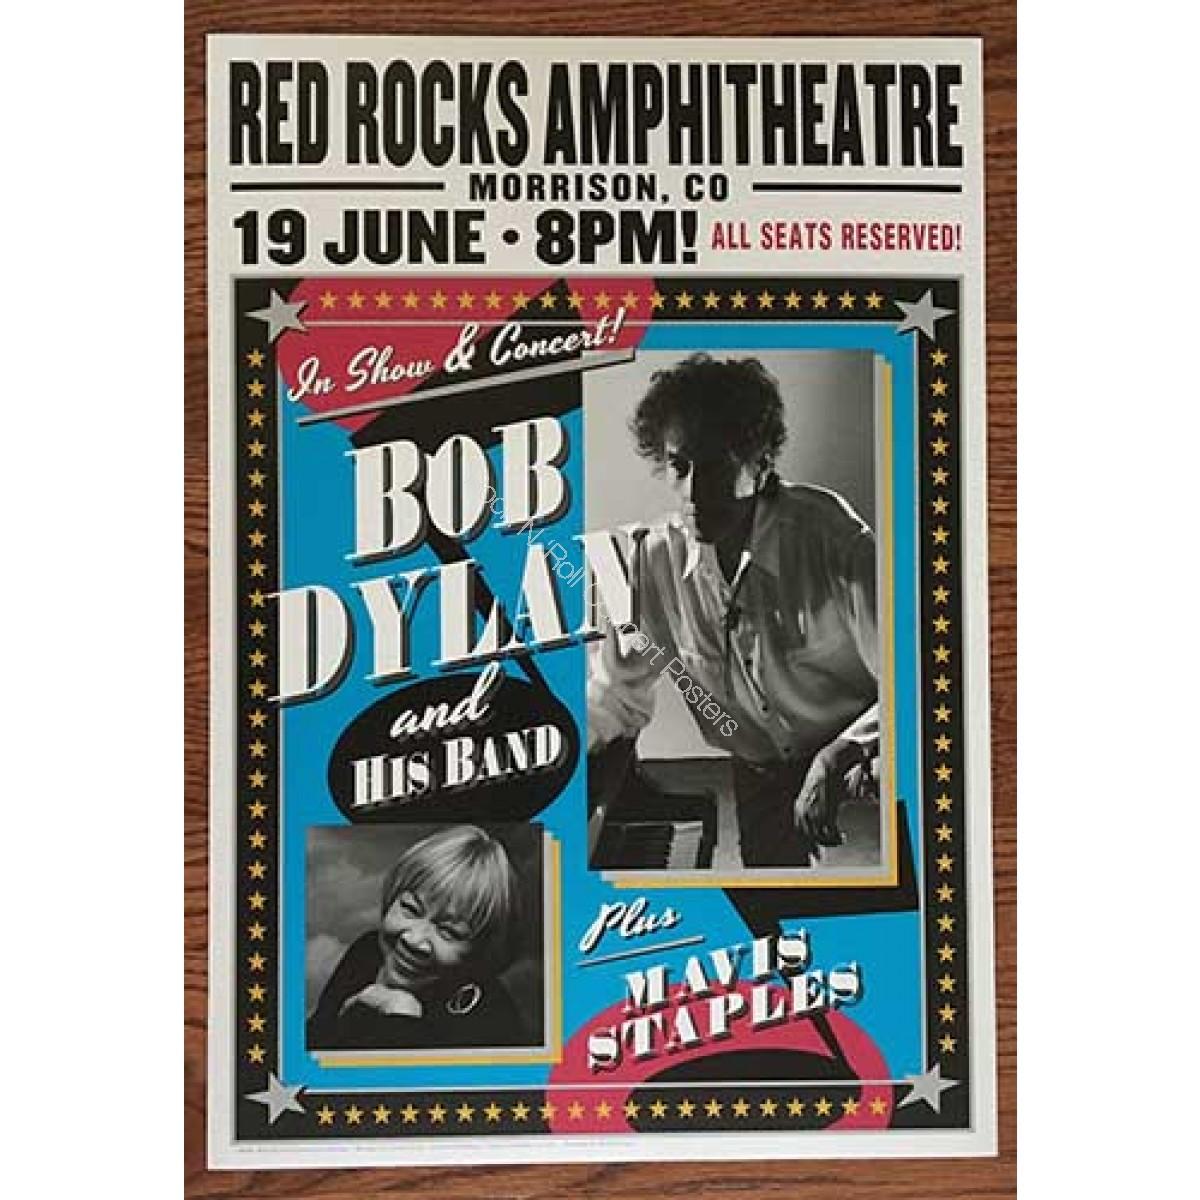 Bob Dylan & Mavis Staples @ Red Rocks Amphitheatre June 19th 2016 Official Poster